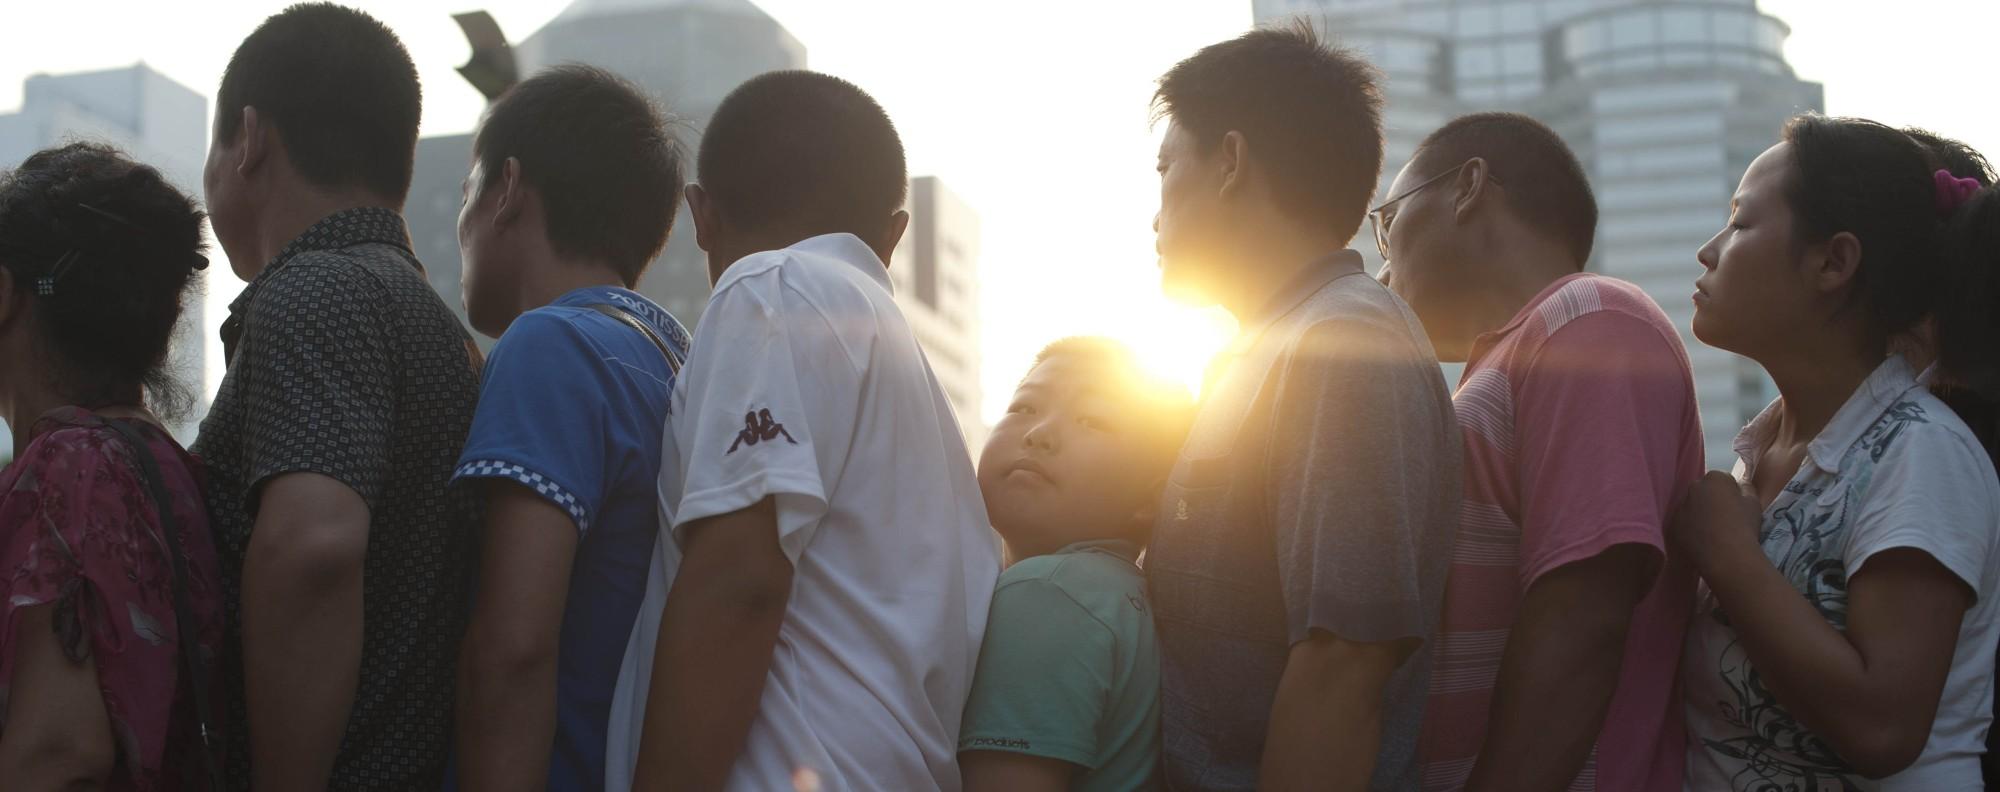 Parents queue to consult doctors at a children's hospital in Beijing.